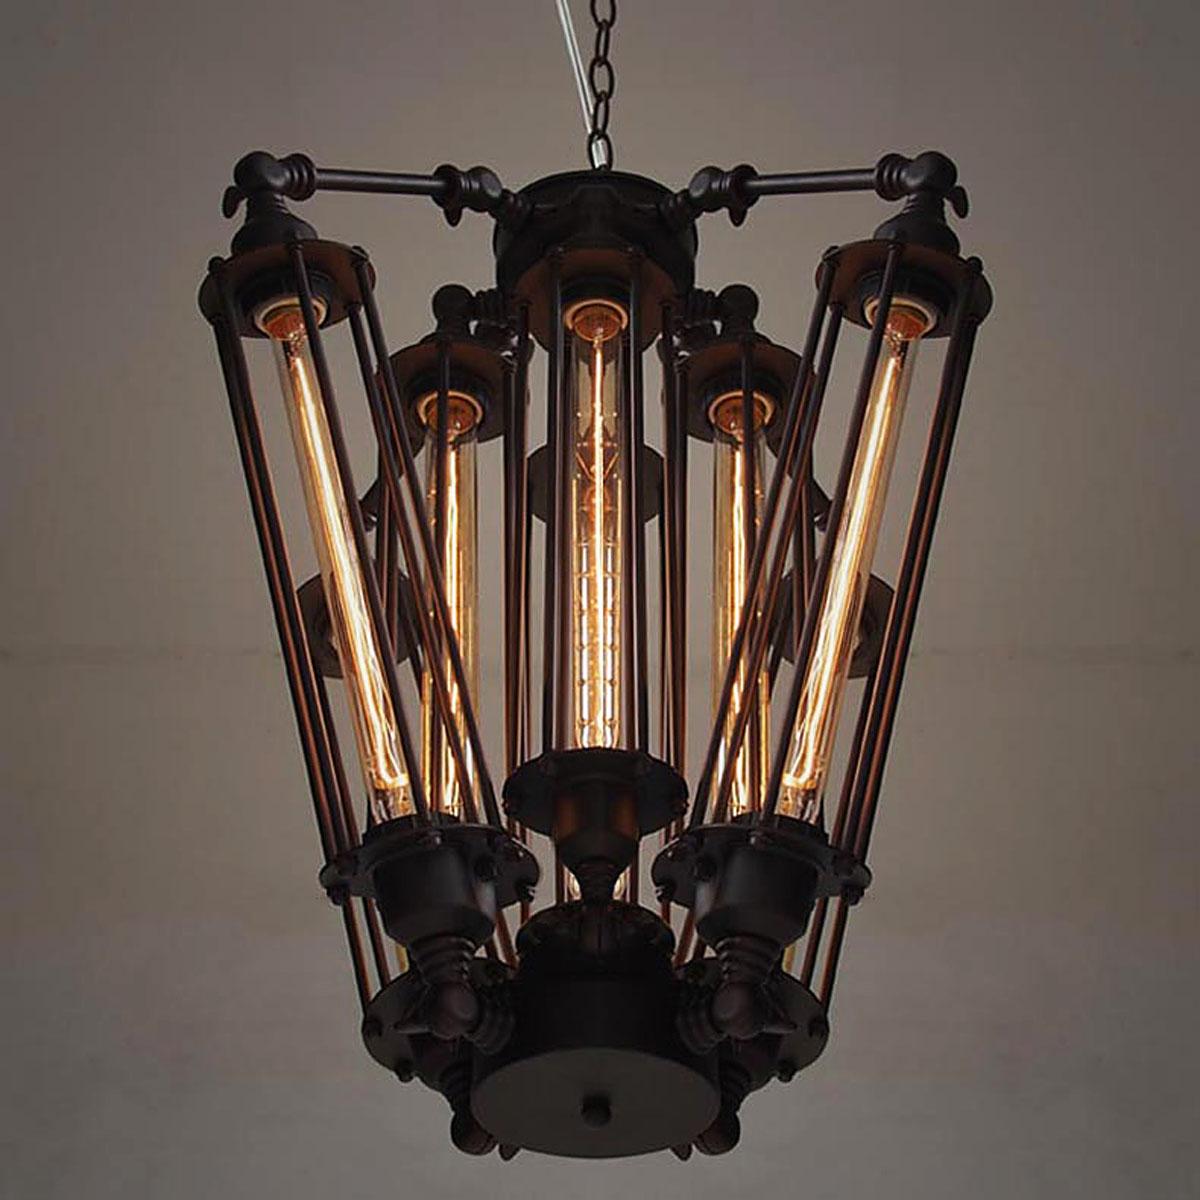 Vintage Industrial Metal Steampunk Chandelier Edison Bulb